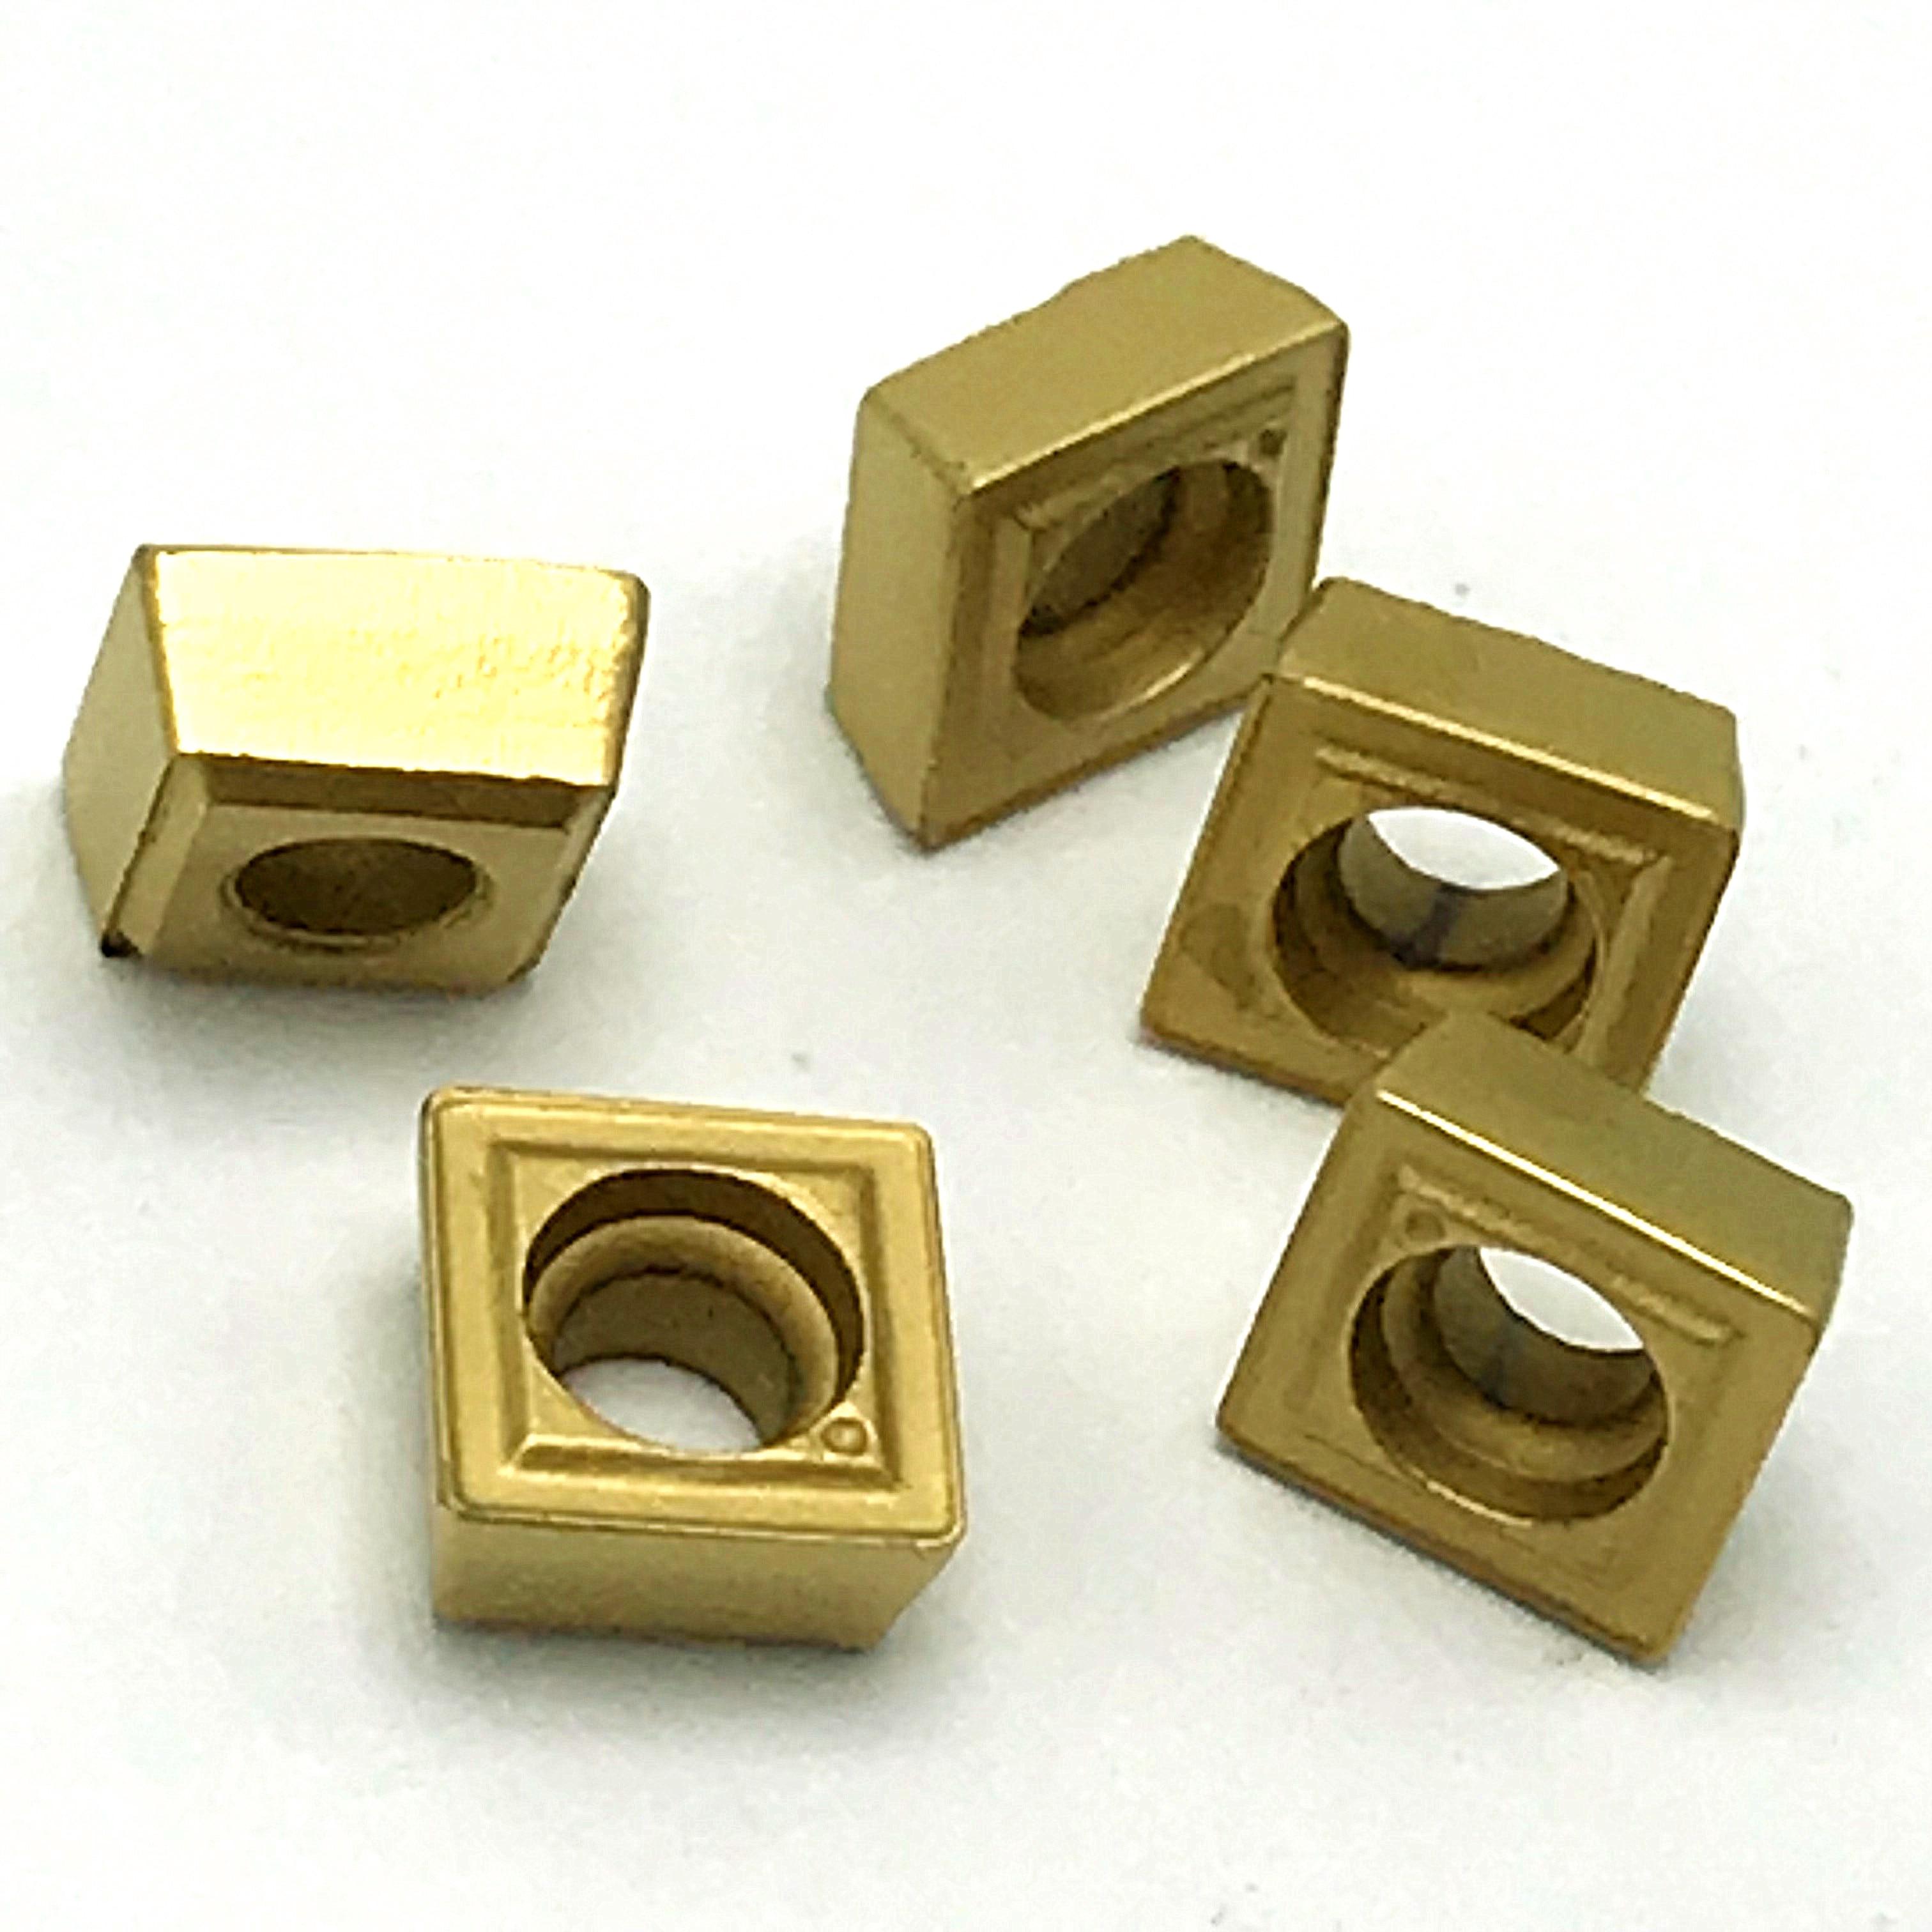 Купить с кэшбэком SPMG050204 DG TT8020 Carbide Insert Turning Tool Turning Milling Cutter CNC Cutting Tool Cutting SPMG 050204 U drill inserts